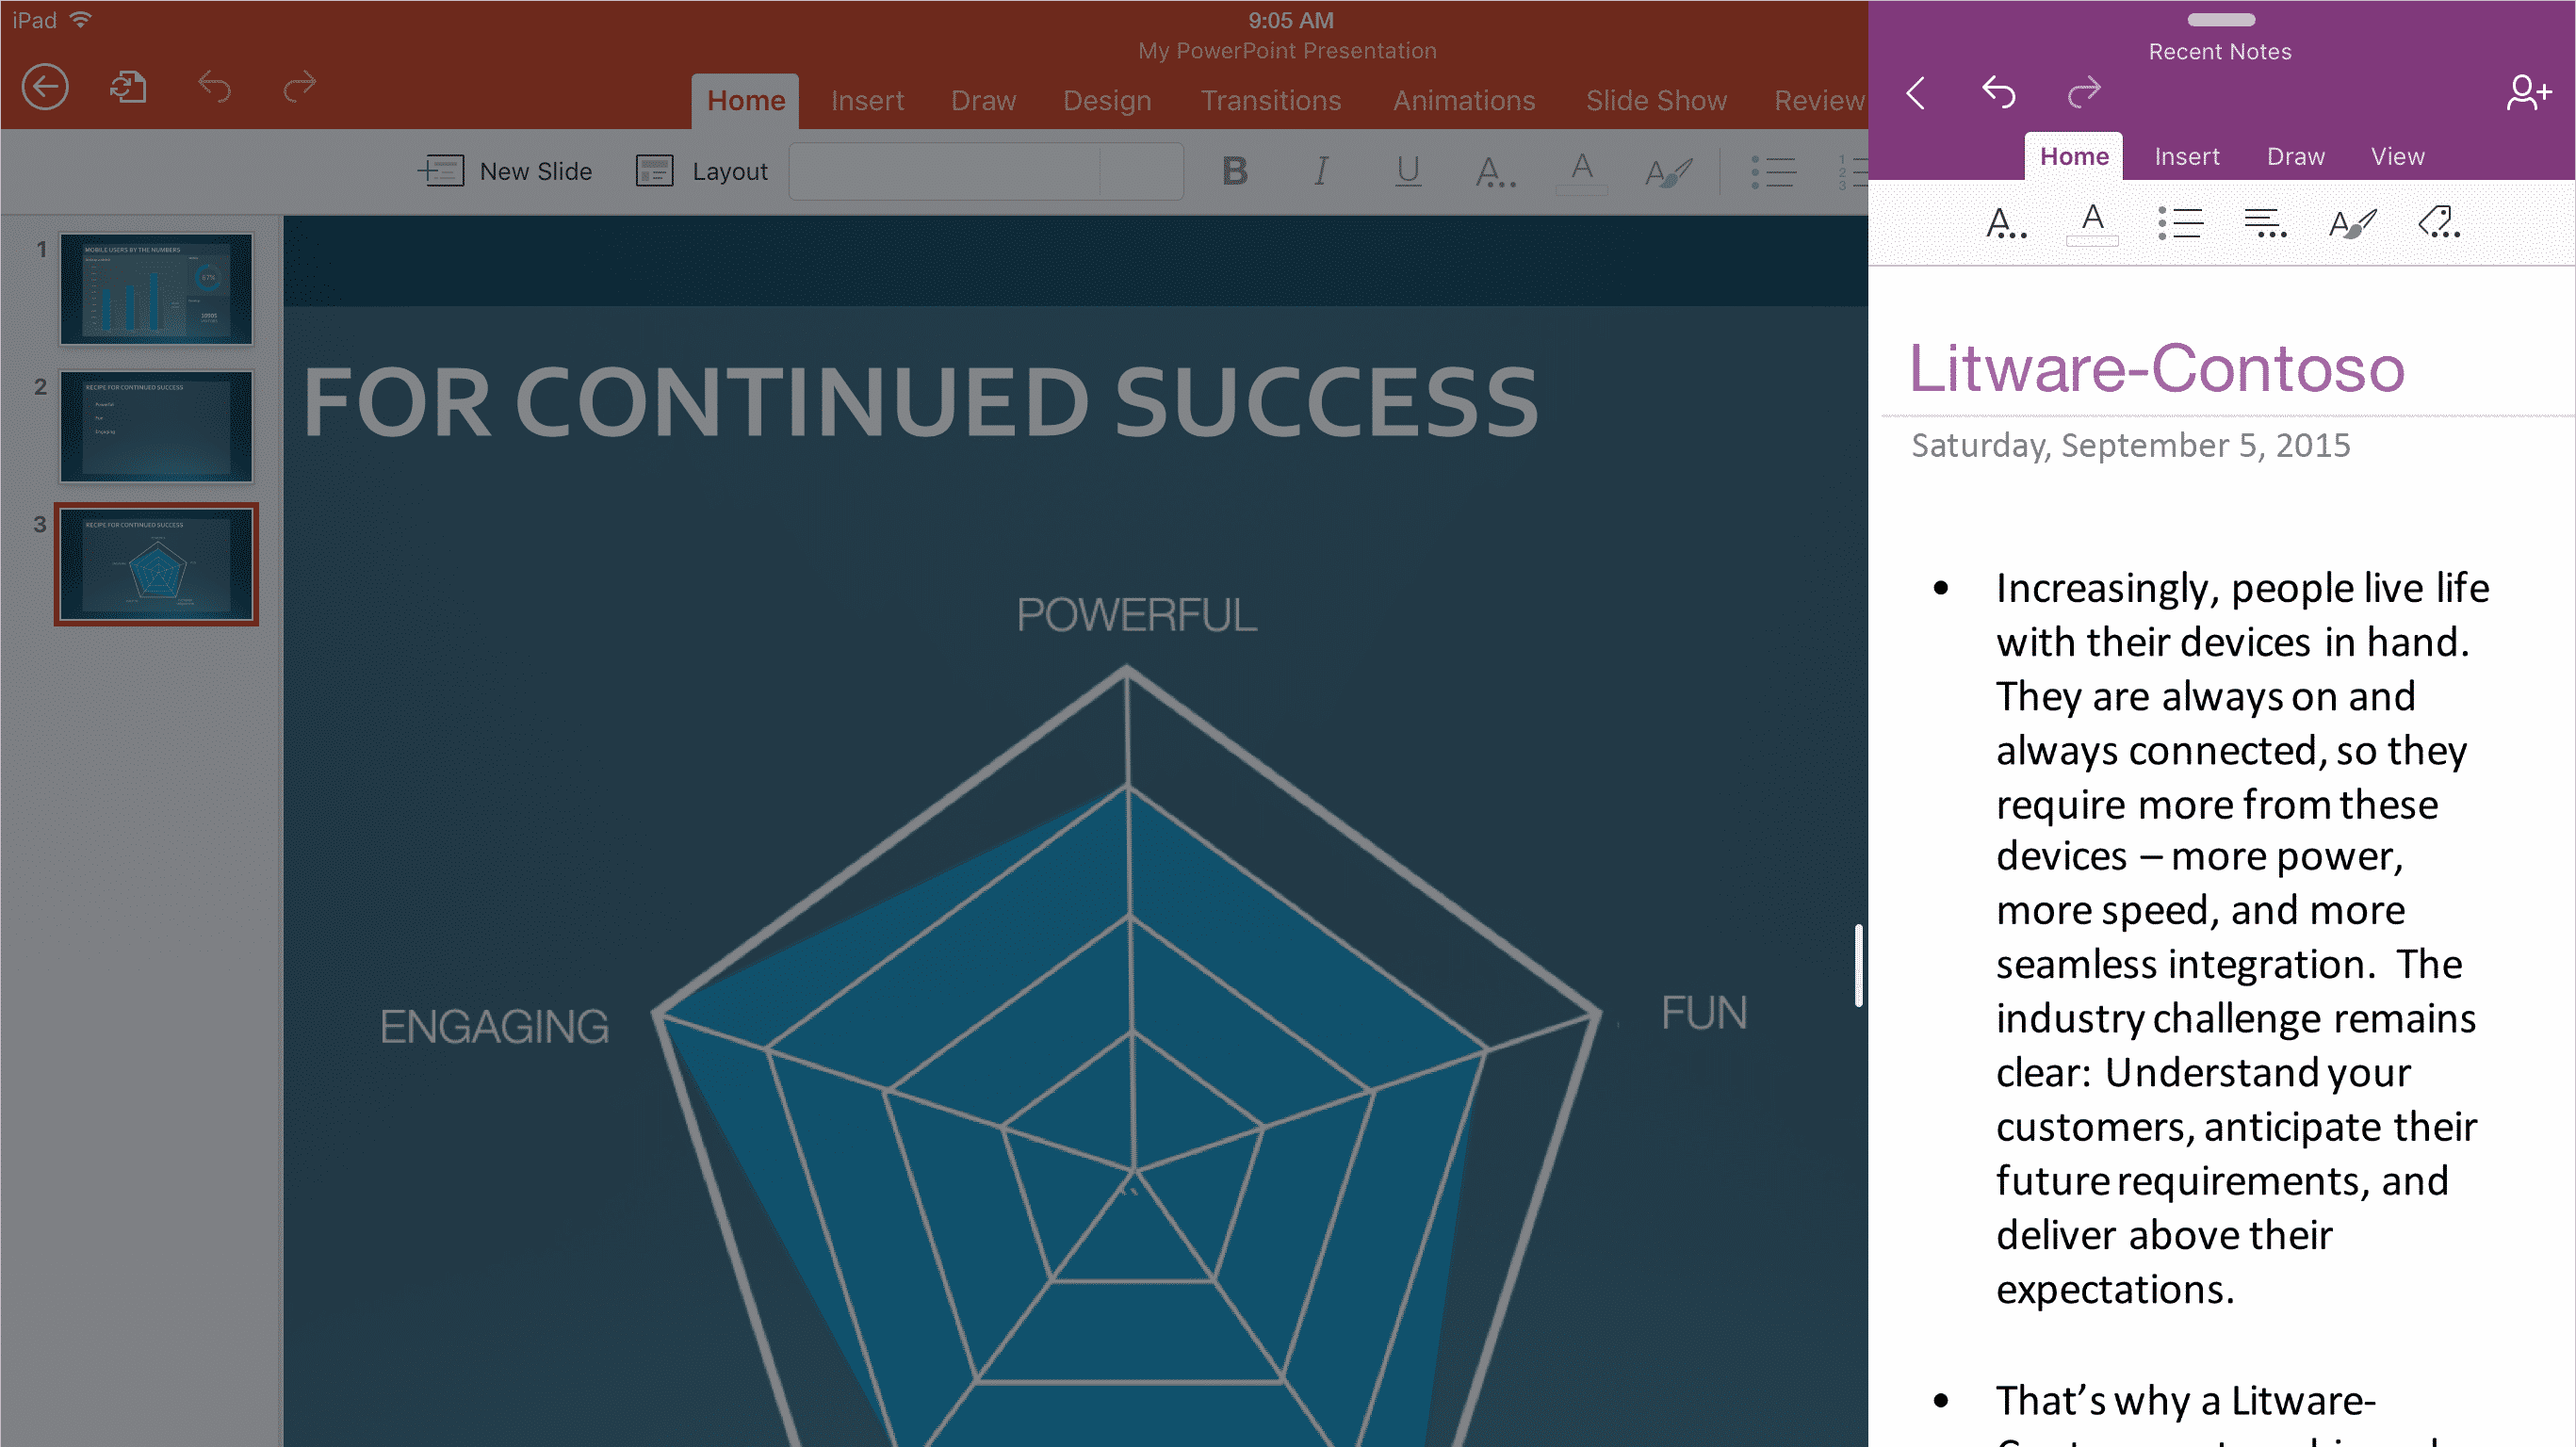 Angepasst: Microsoft veröffentlicht optimierte Office-Apps fürs iPad Pro